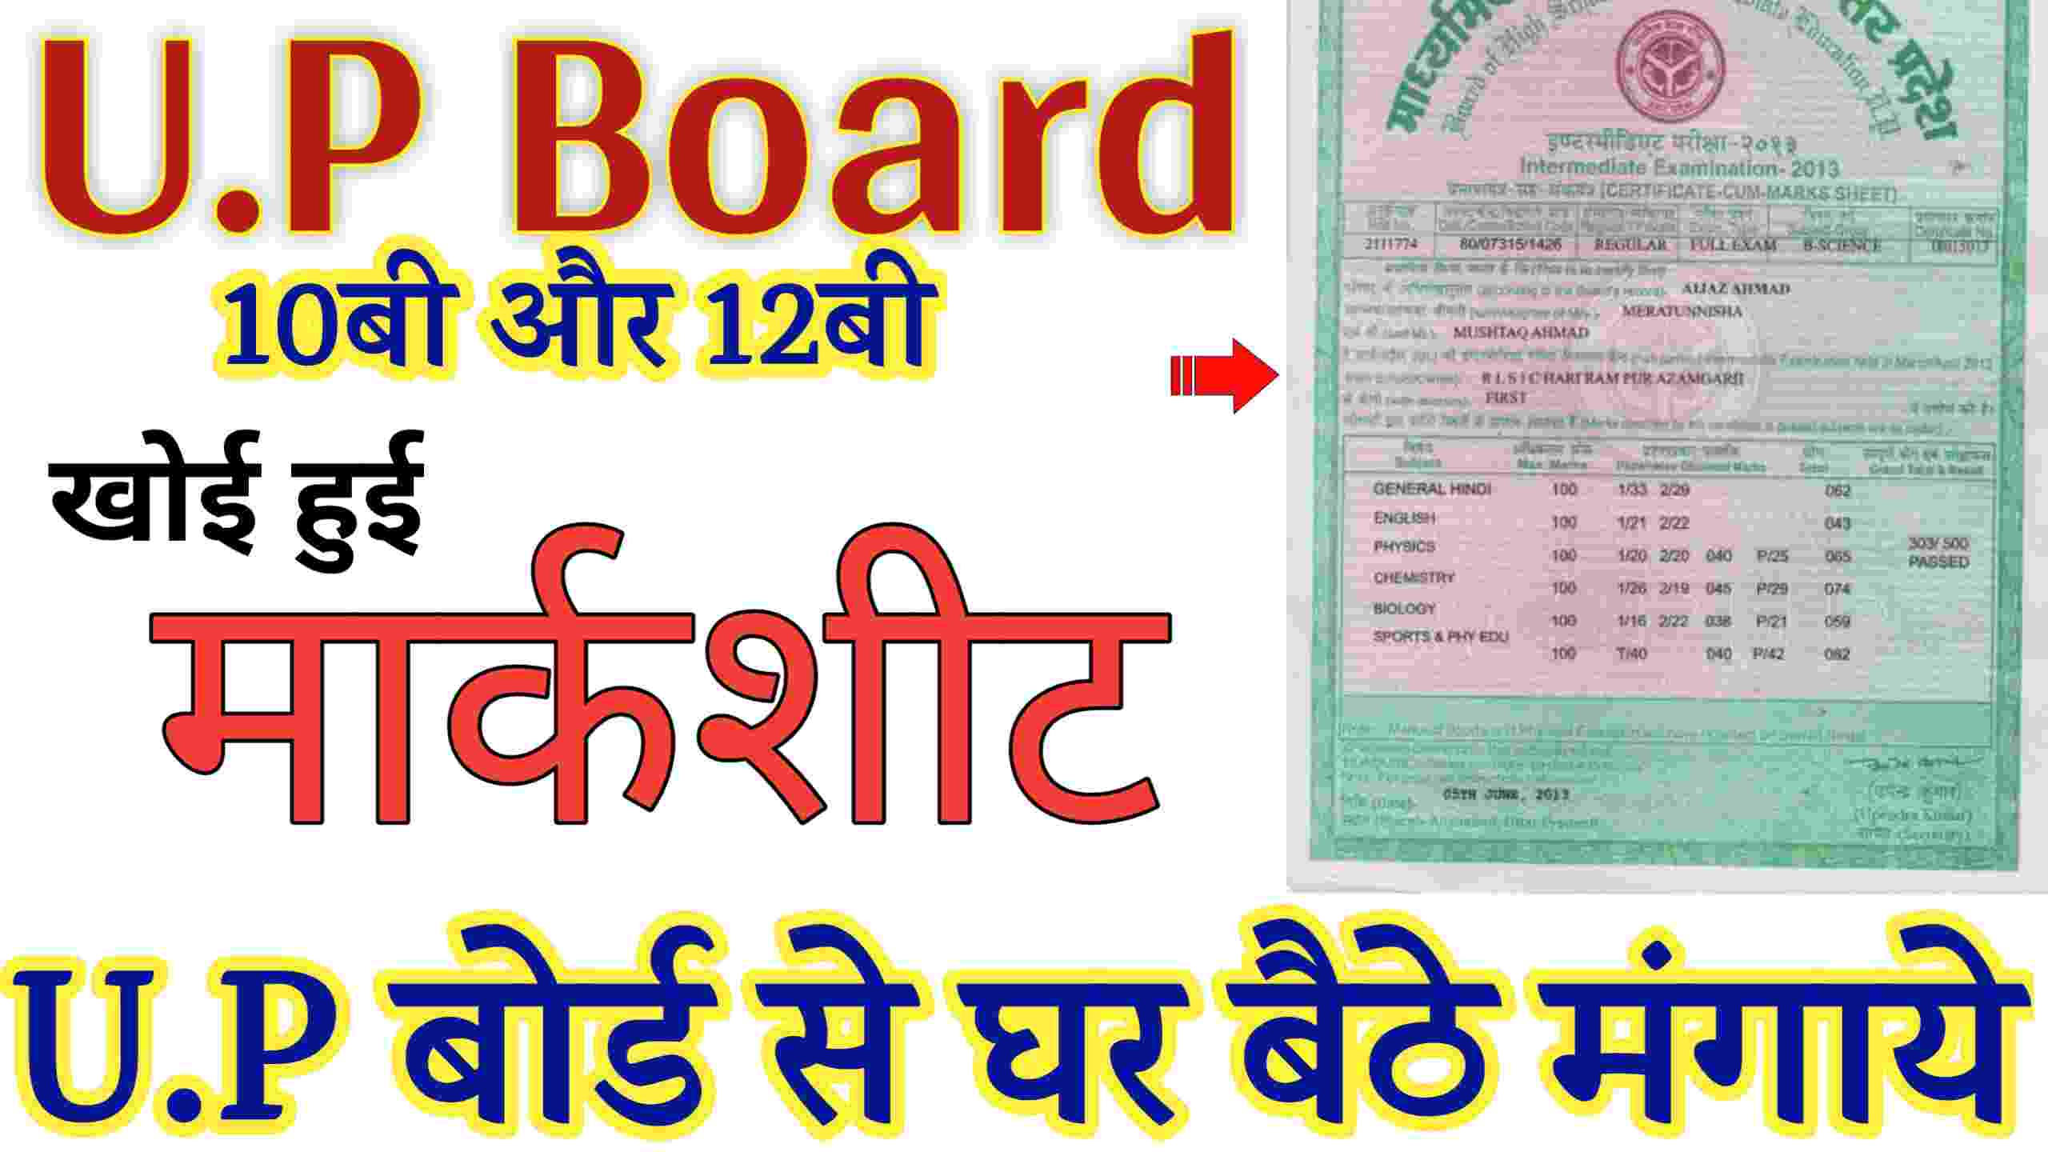 U.P Board Duplicate Marksheet Or Certificate Online up board 10th ,12th